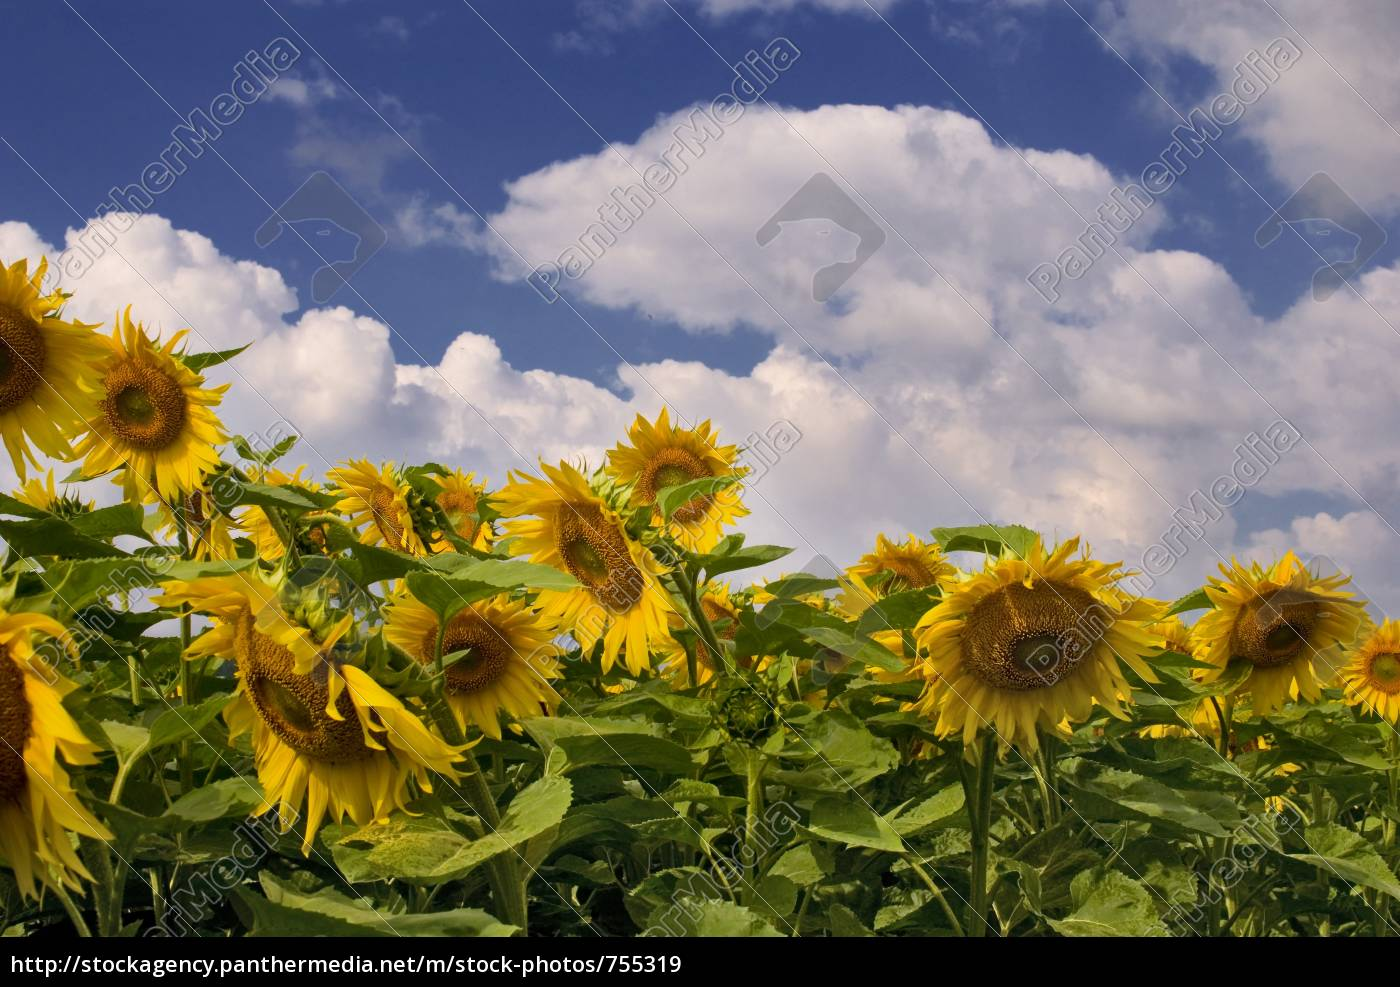 sunflower, field - 755319